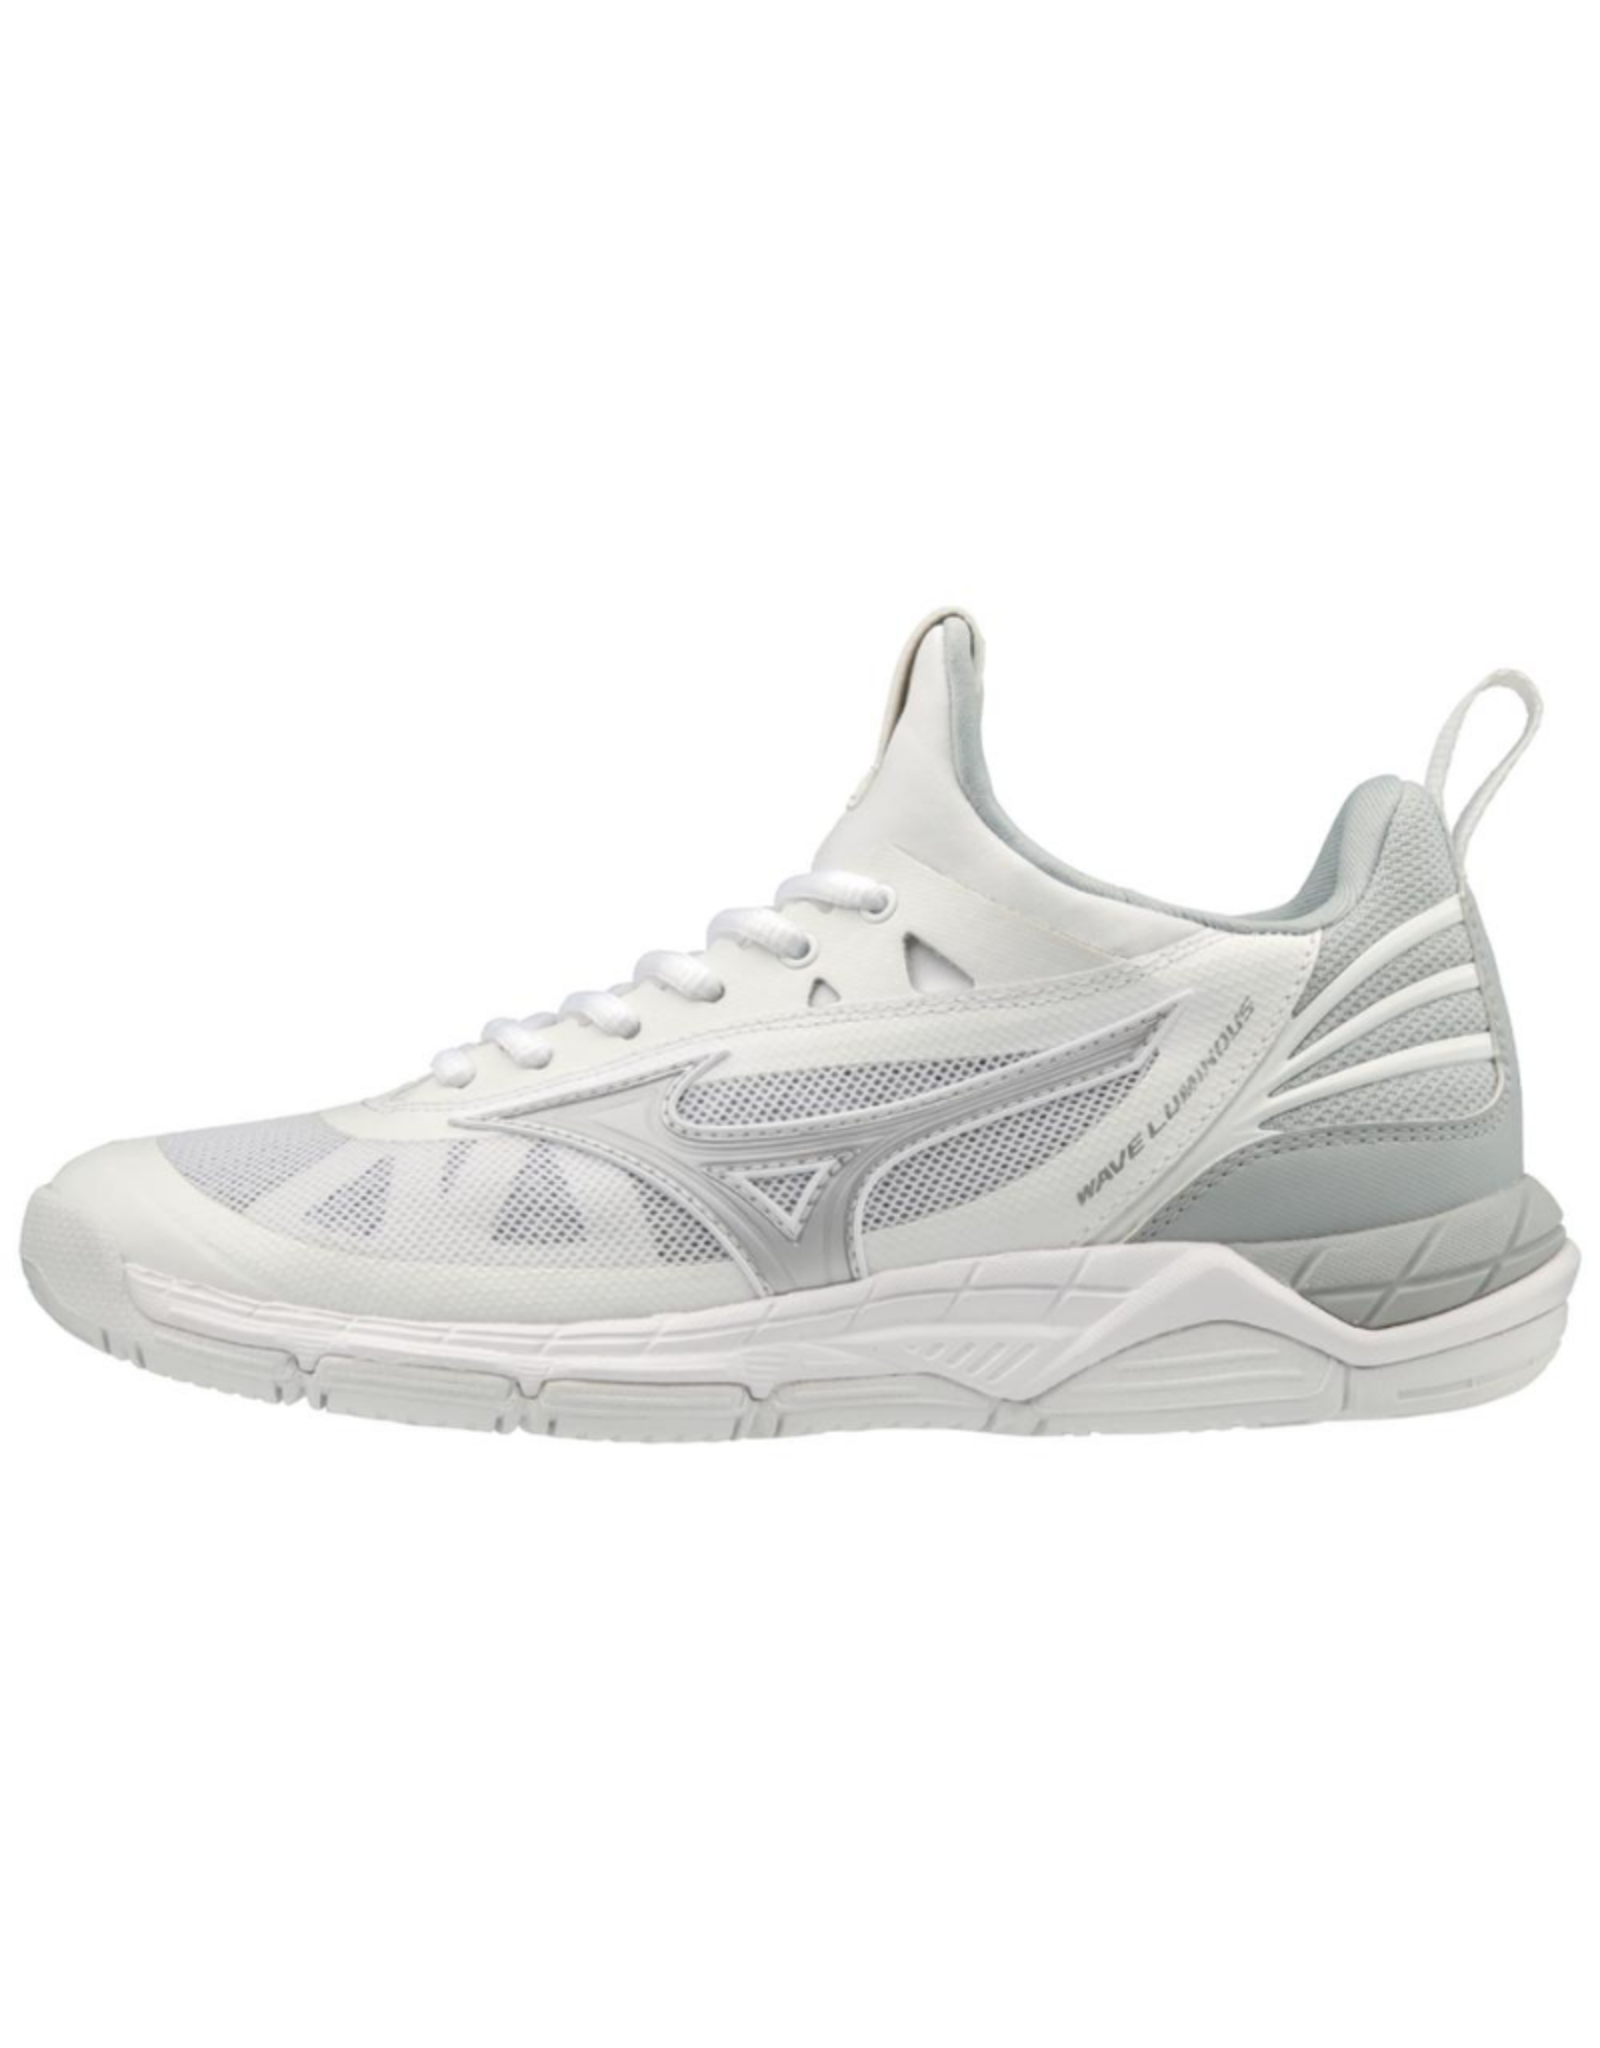 Mizuno Women's Wave Luminous Shoe White